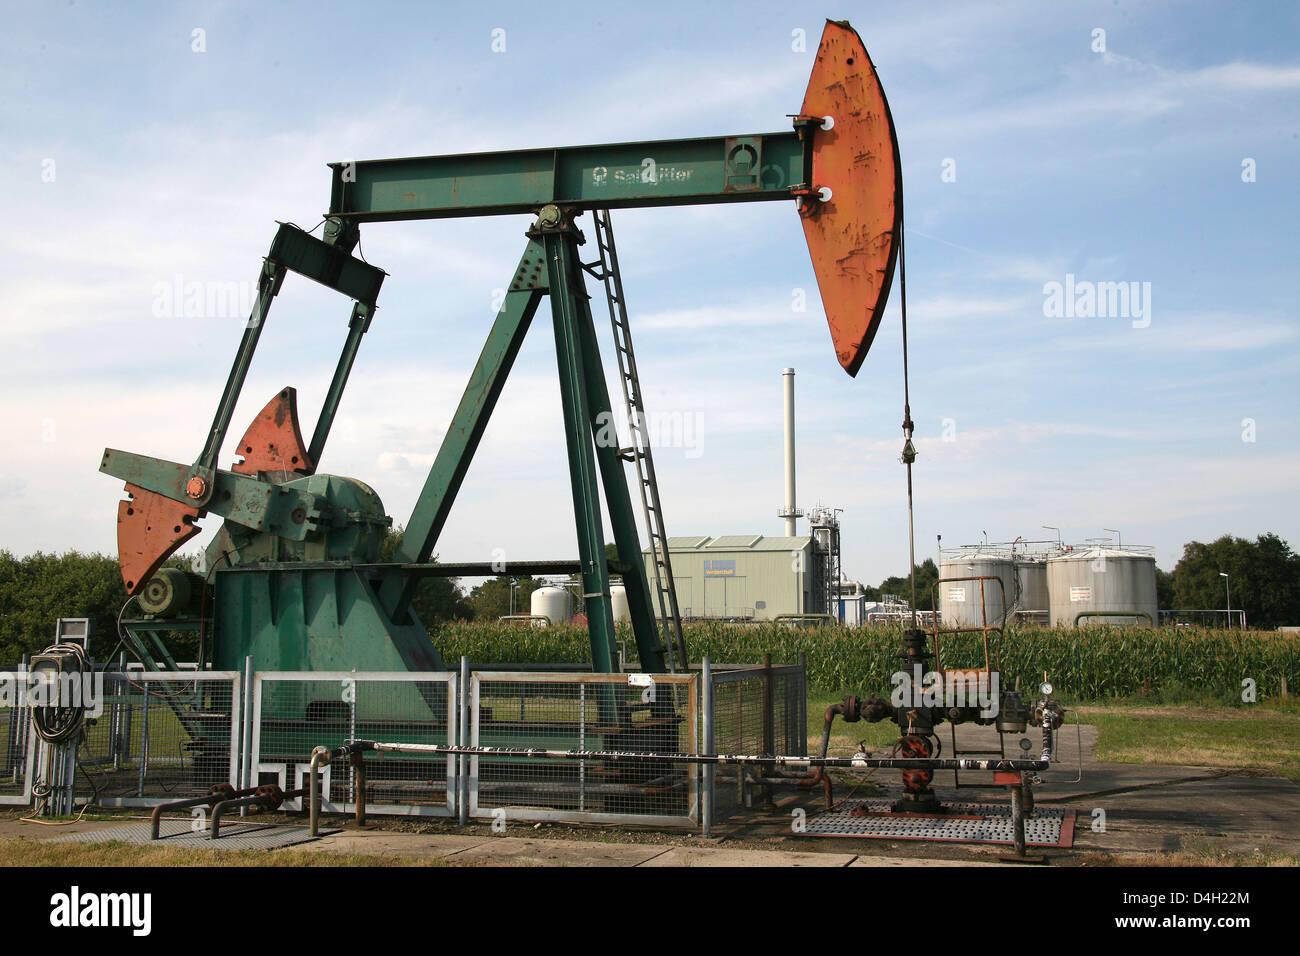 A pumpjack-type oil pump seen near Emlichheim, County Bentheim, Germany, 28 July 2008. Since 60 years Kassel-based Stock Photo